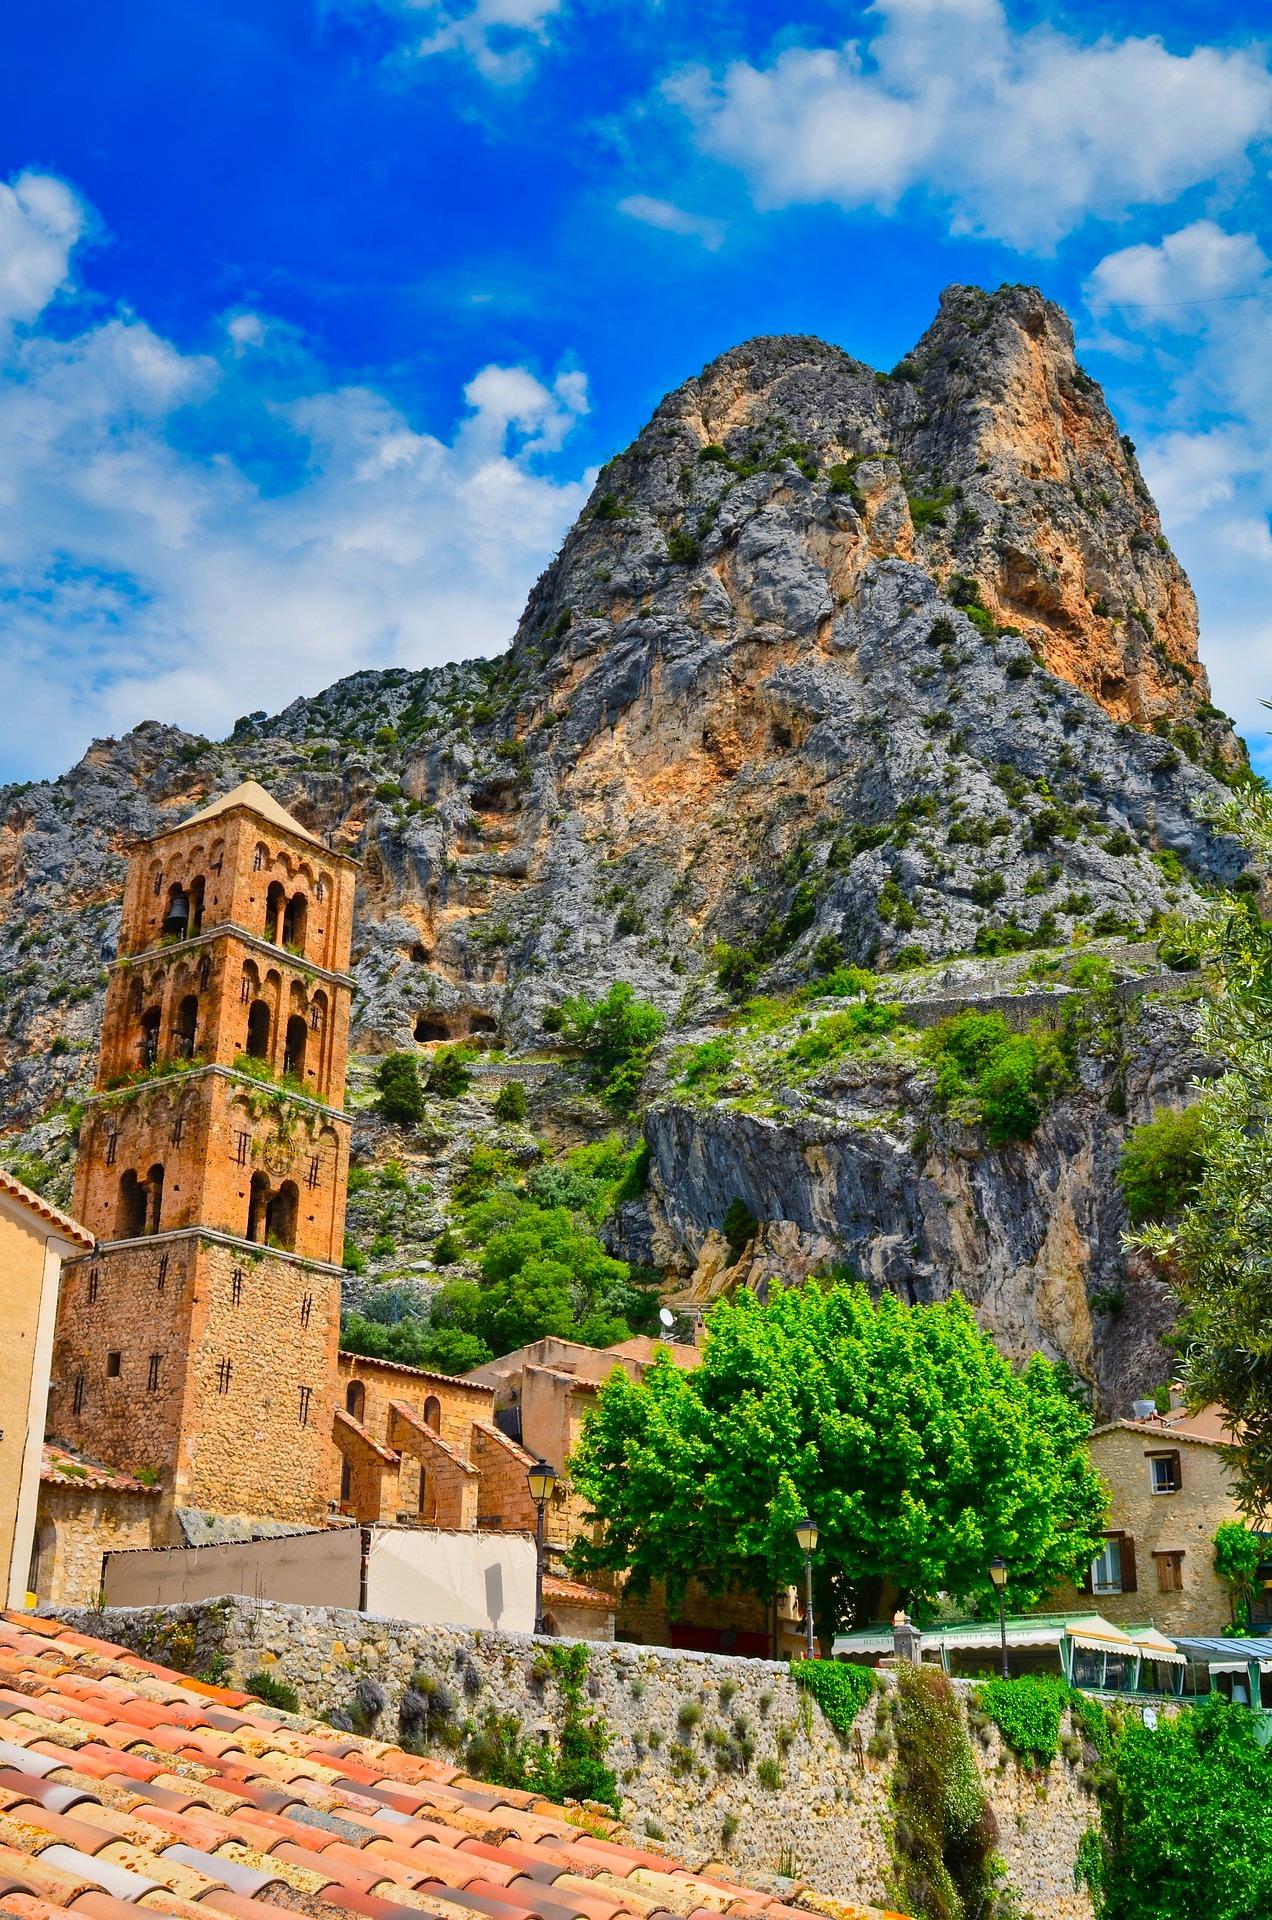 Europe, Fall, Autumn, Romantic, Travel, Experience, Local, LocalBini, BiniBlog, travel tips, forest, yellow, couple, Mourstiers Sainte-Marie, Alpes-de-Haute-Provence, France